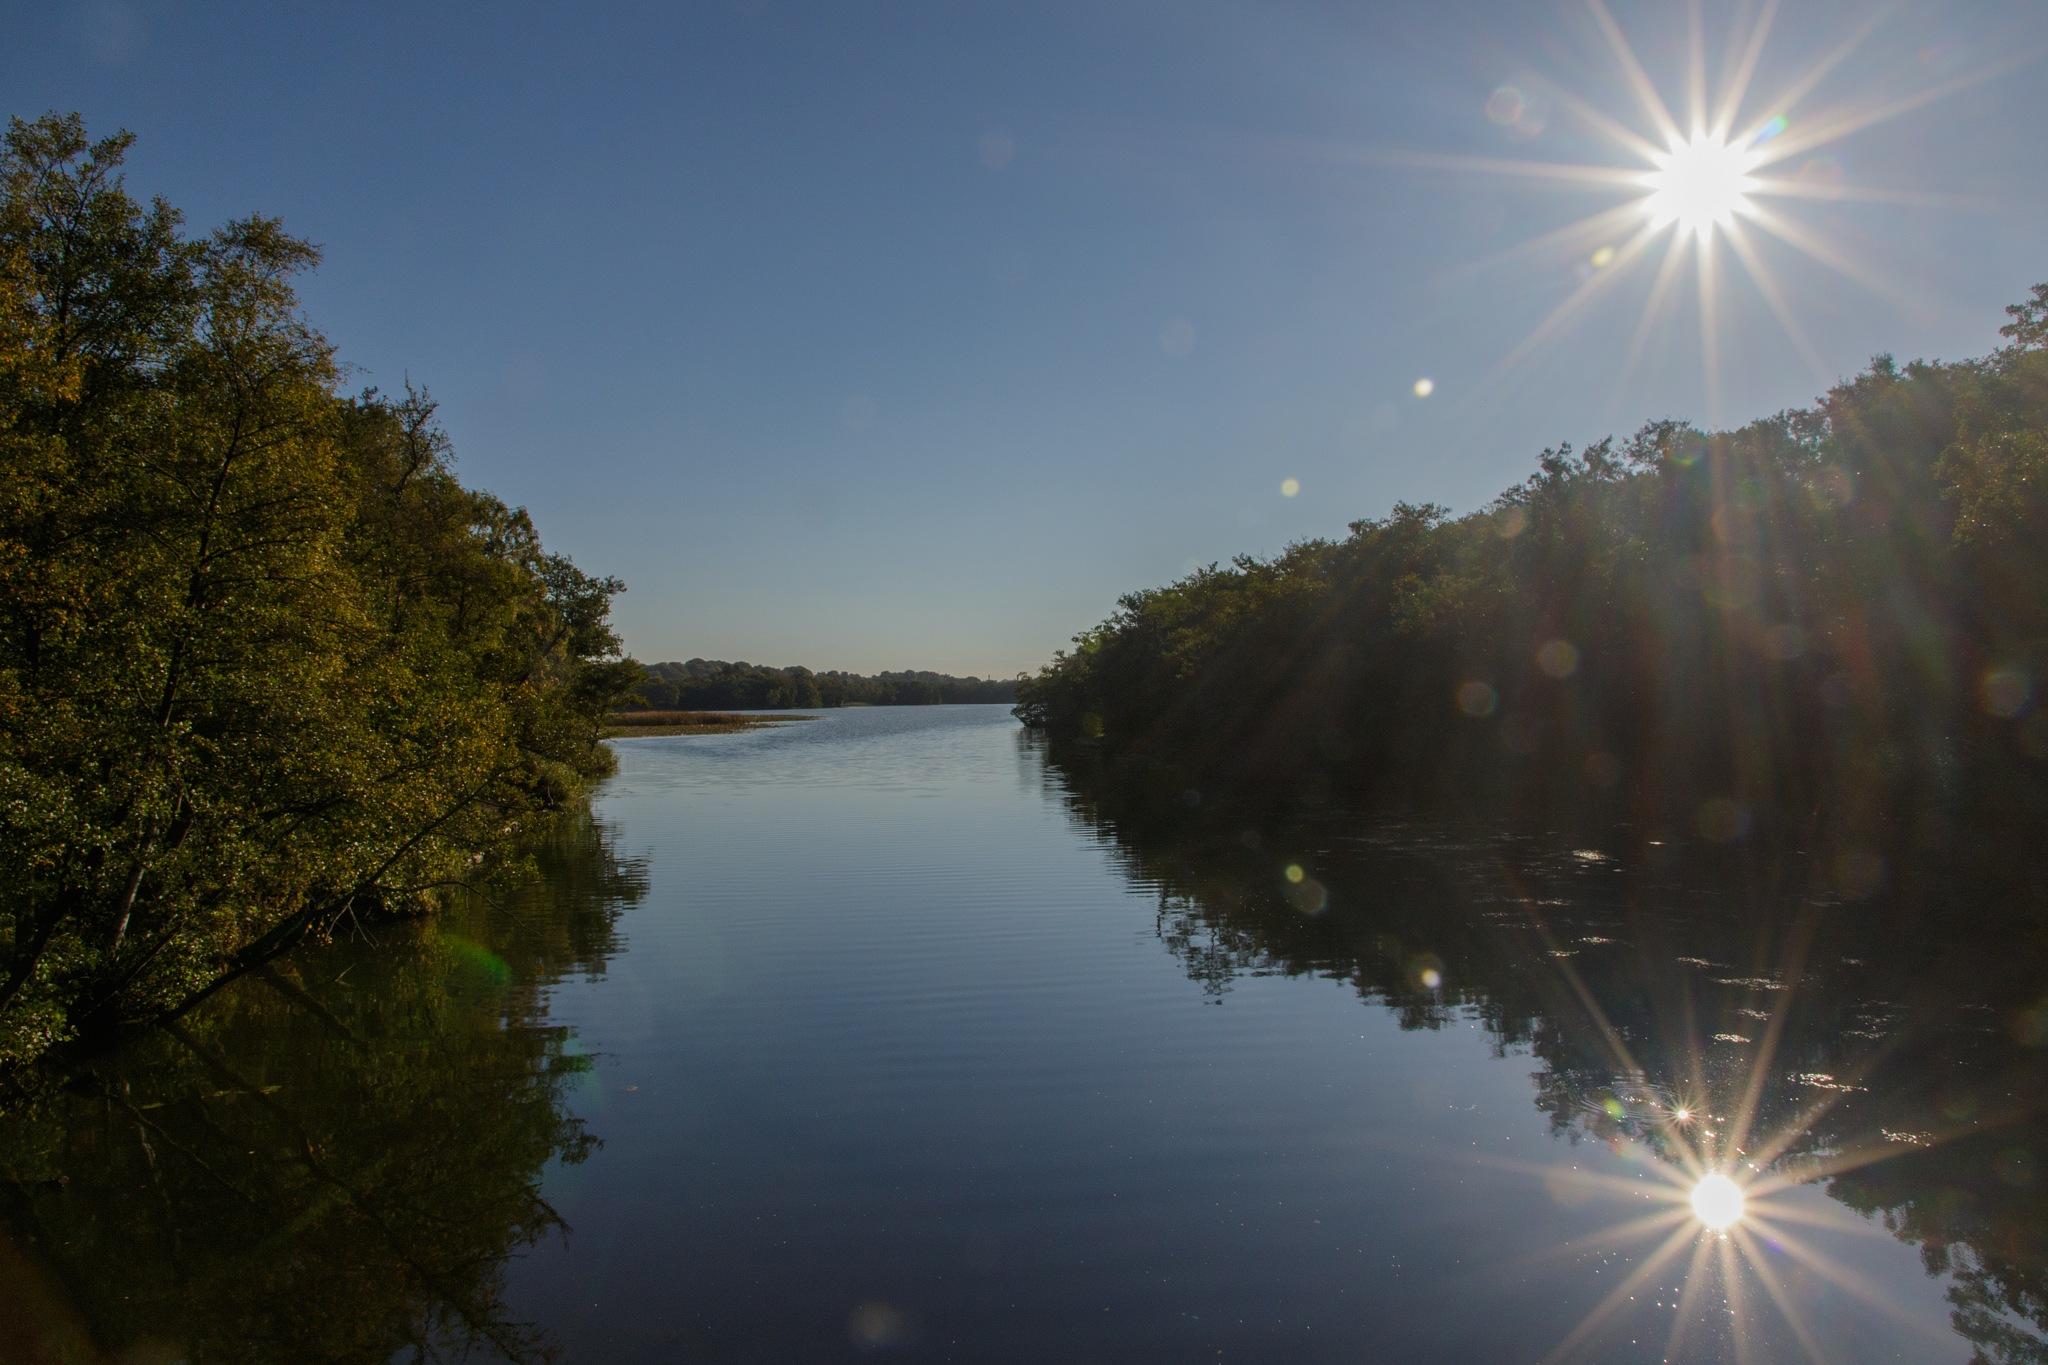 Early morning sun reflections in the lake by Bjarne Gertz Pedersen